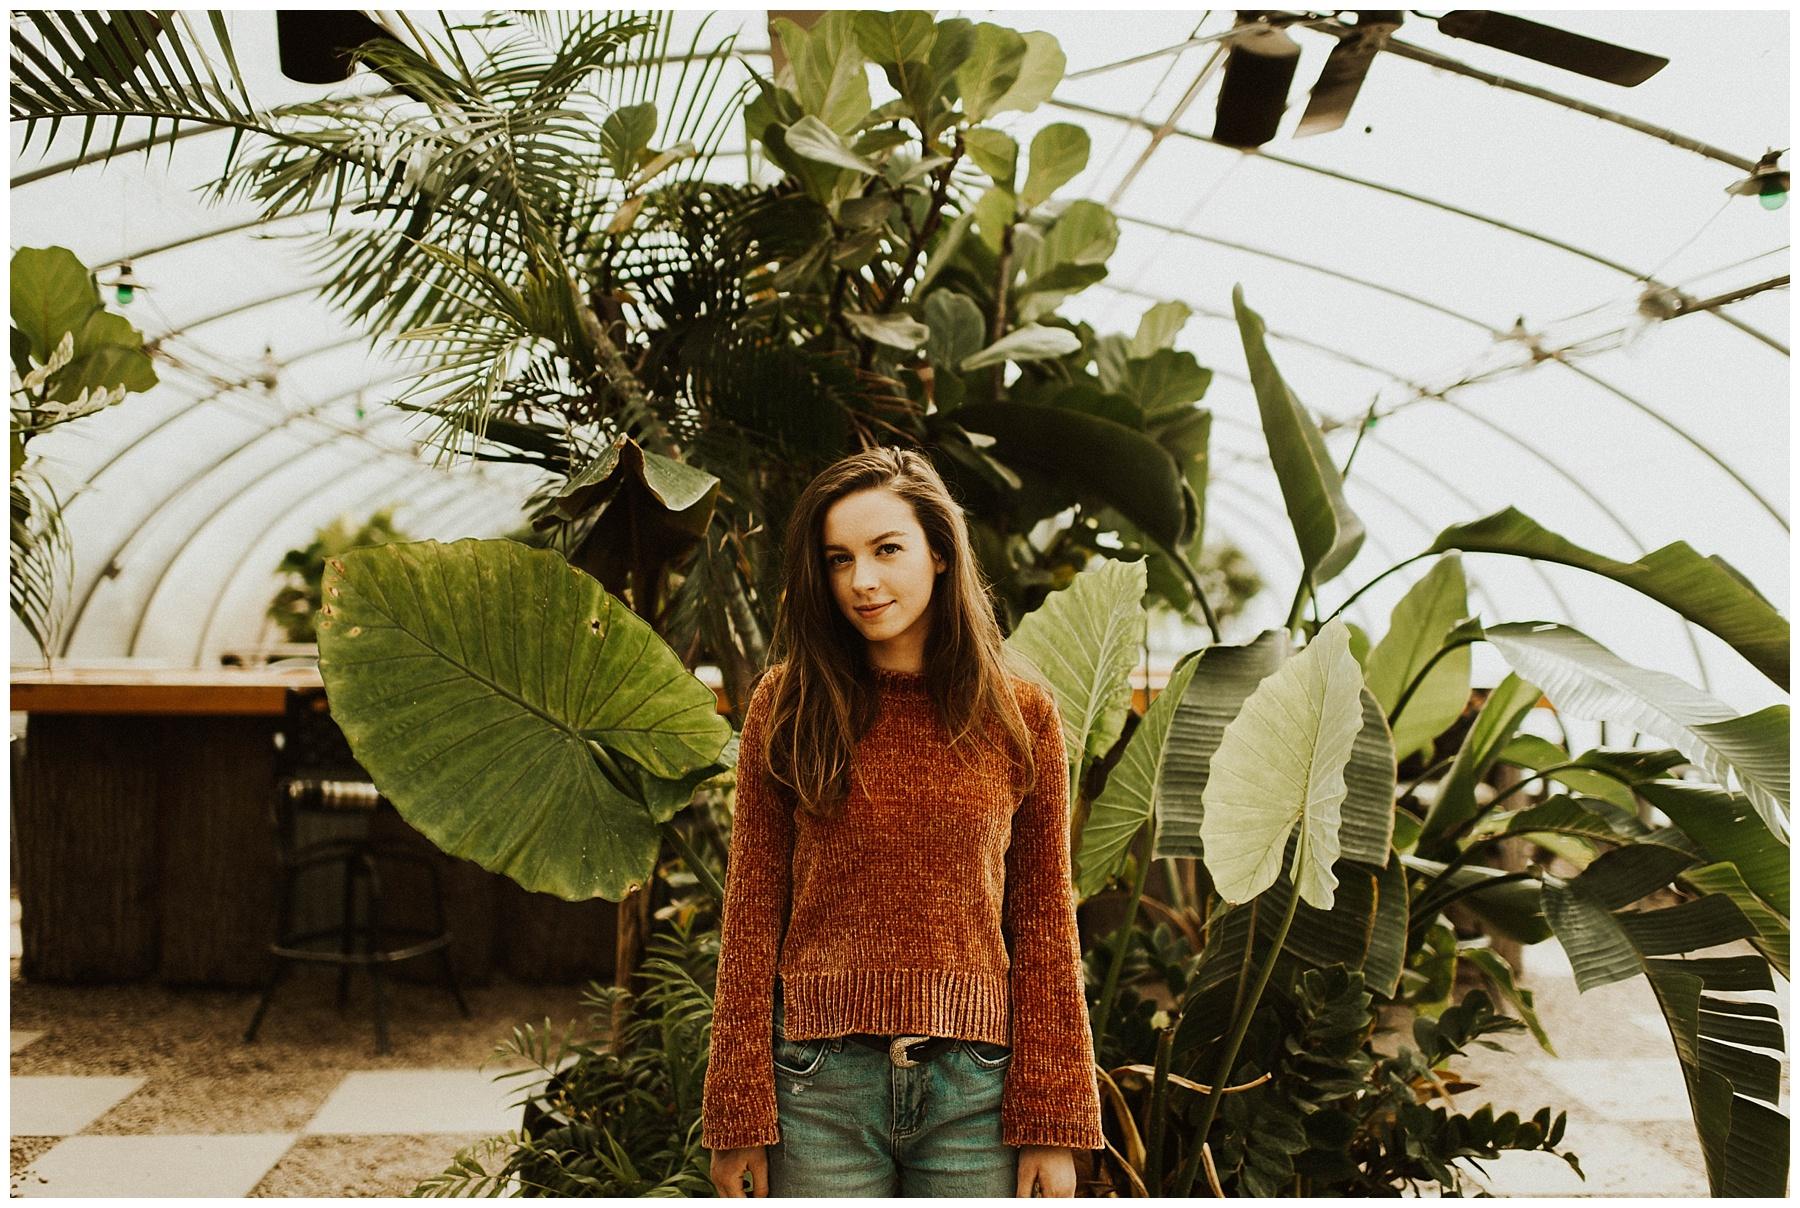 0bcf8ae13c Sabrina    Candid Portraits - Lauren F.otography